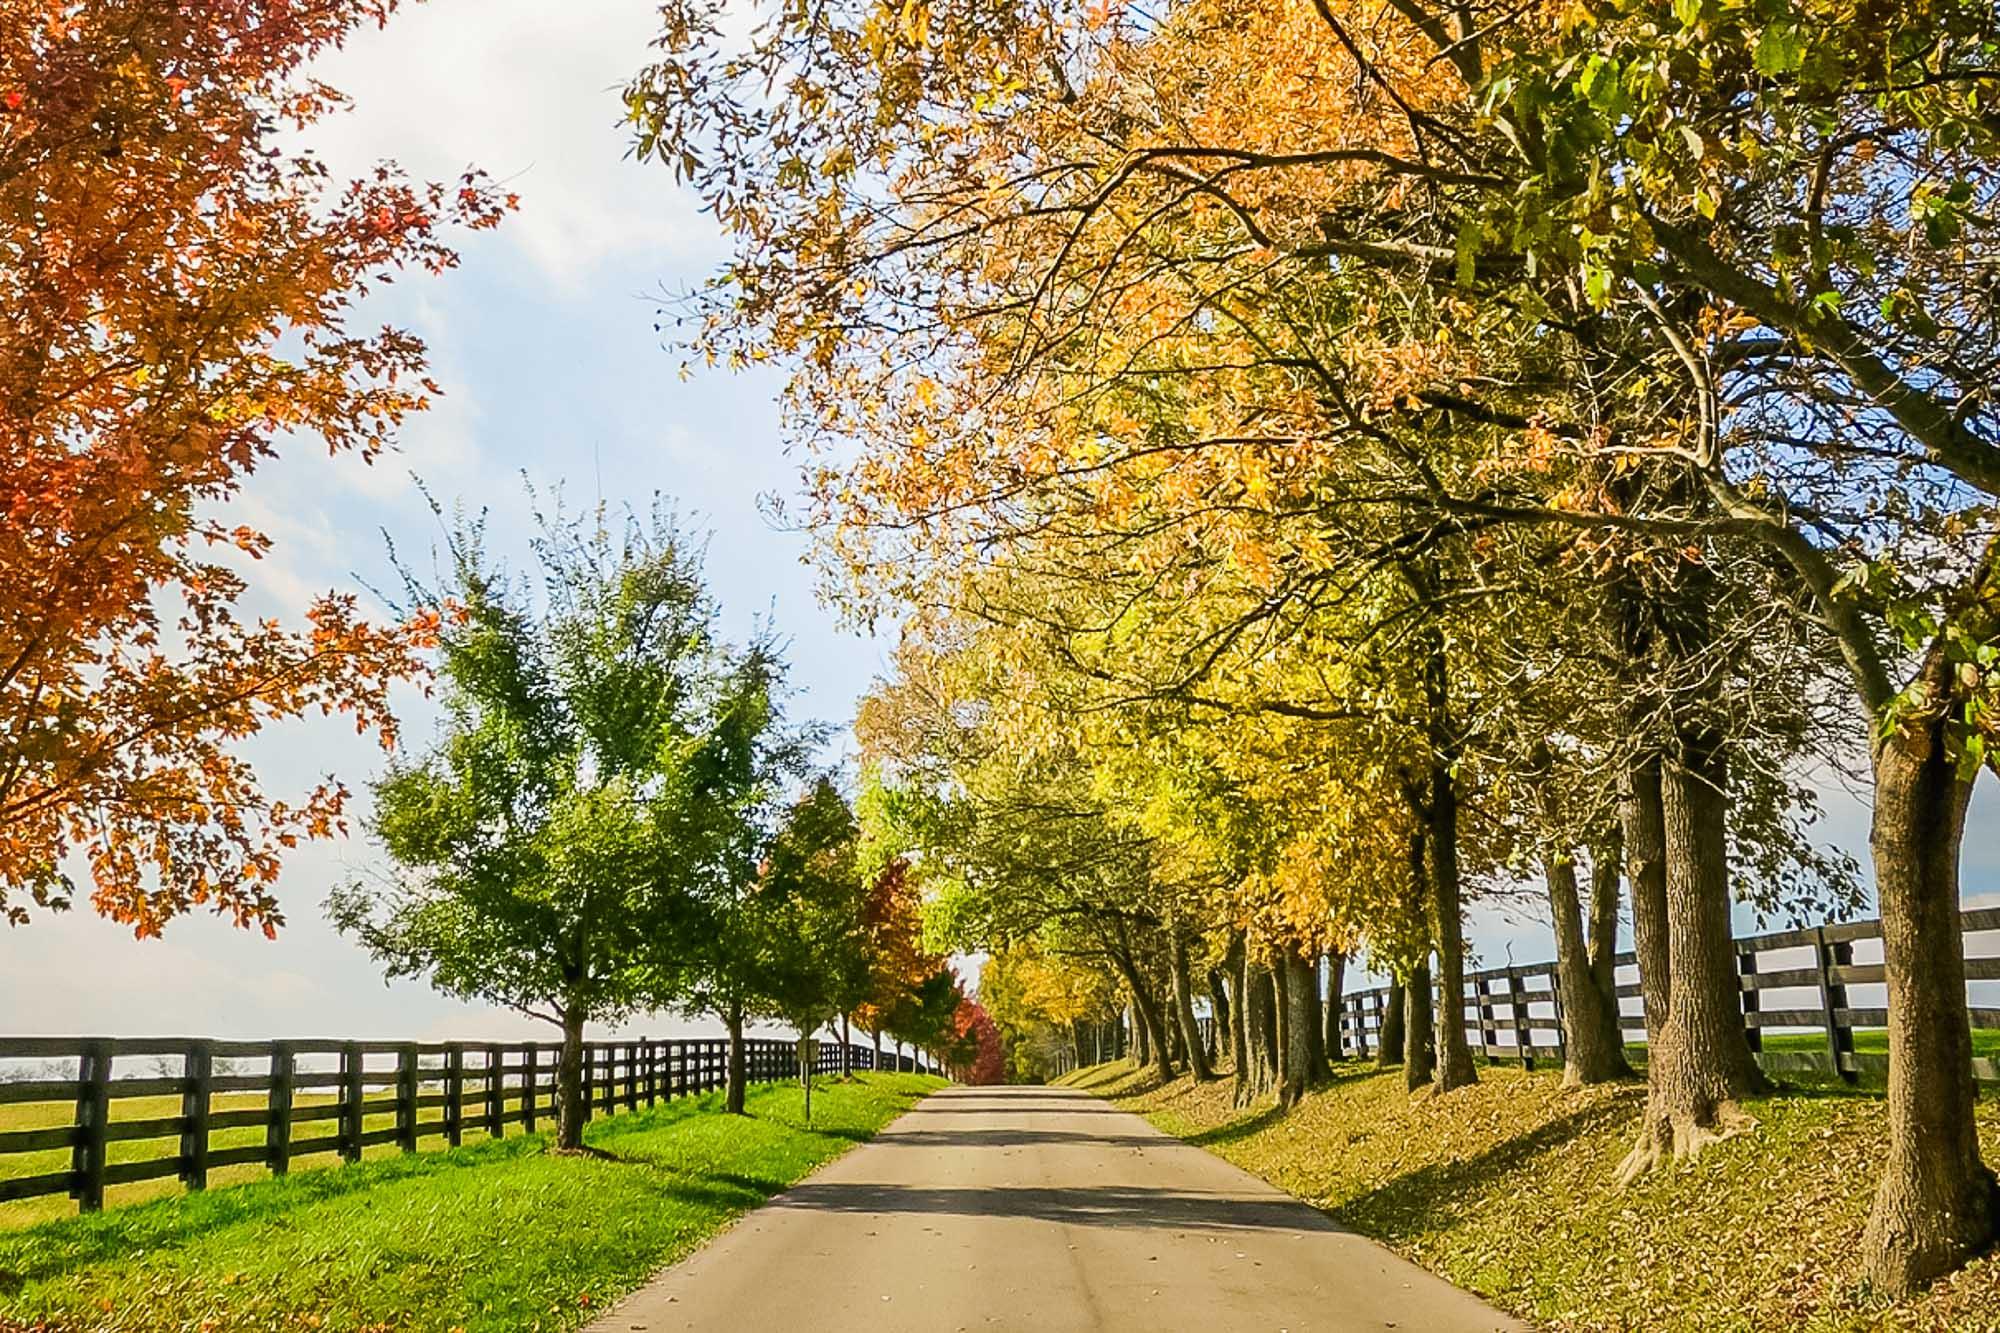 Travel Diary: 3 Days on the Kentucky Bourbon Trail